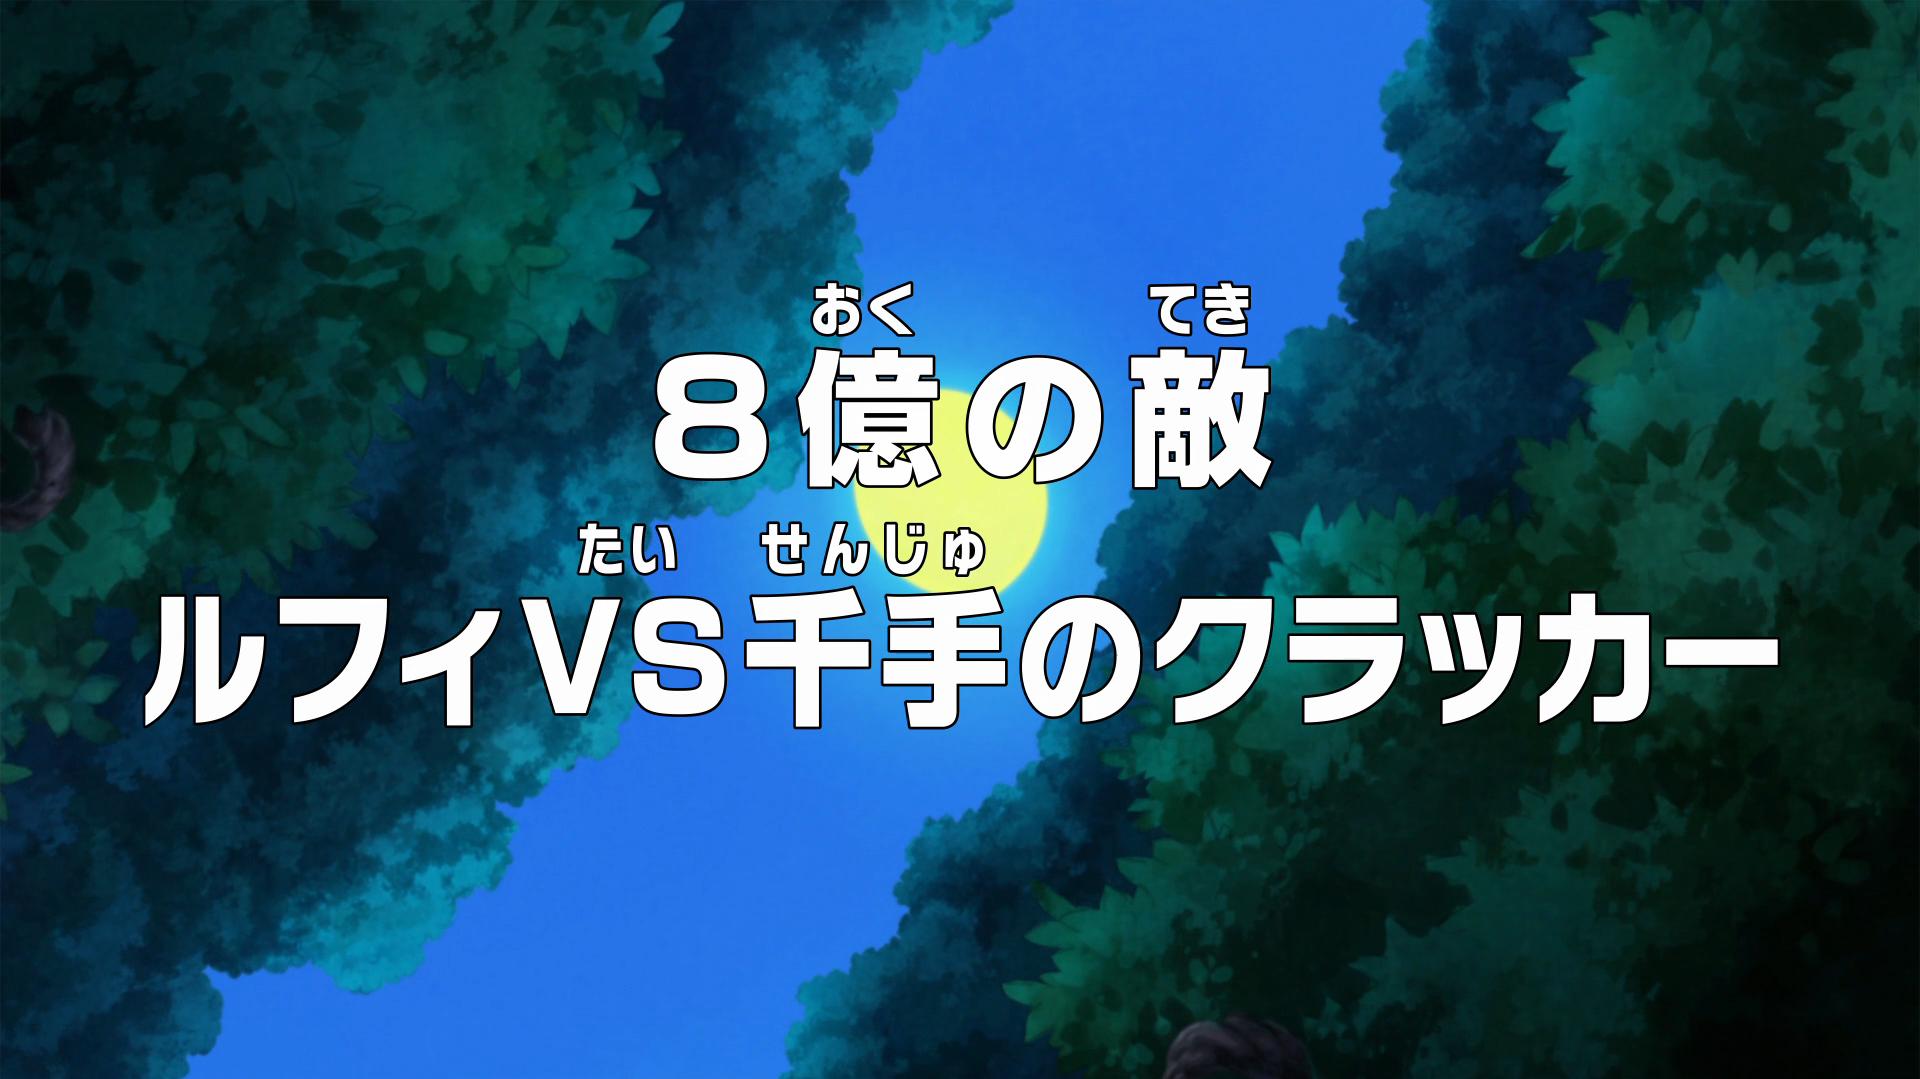 Episode 798